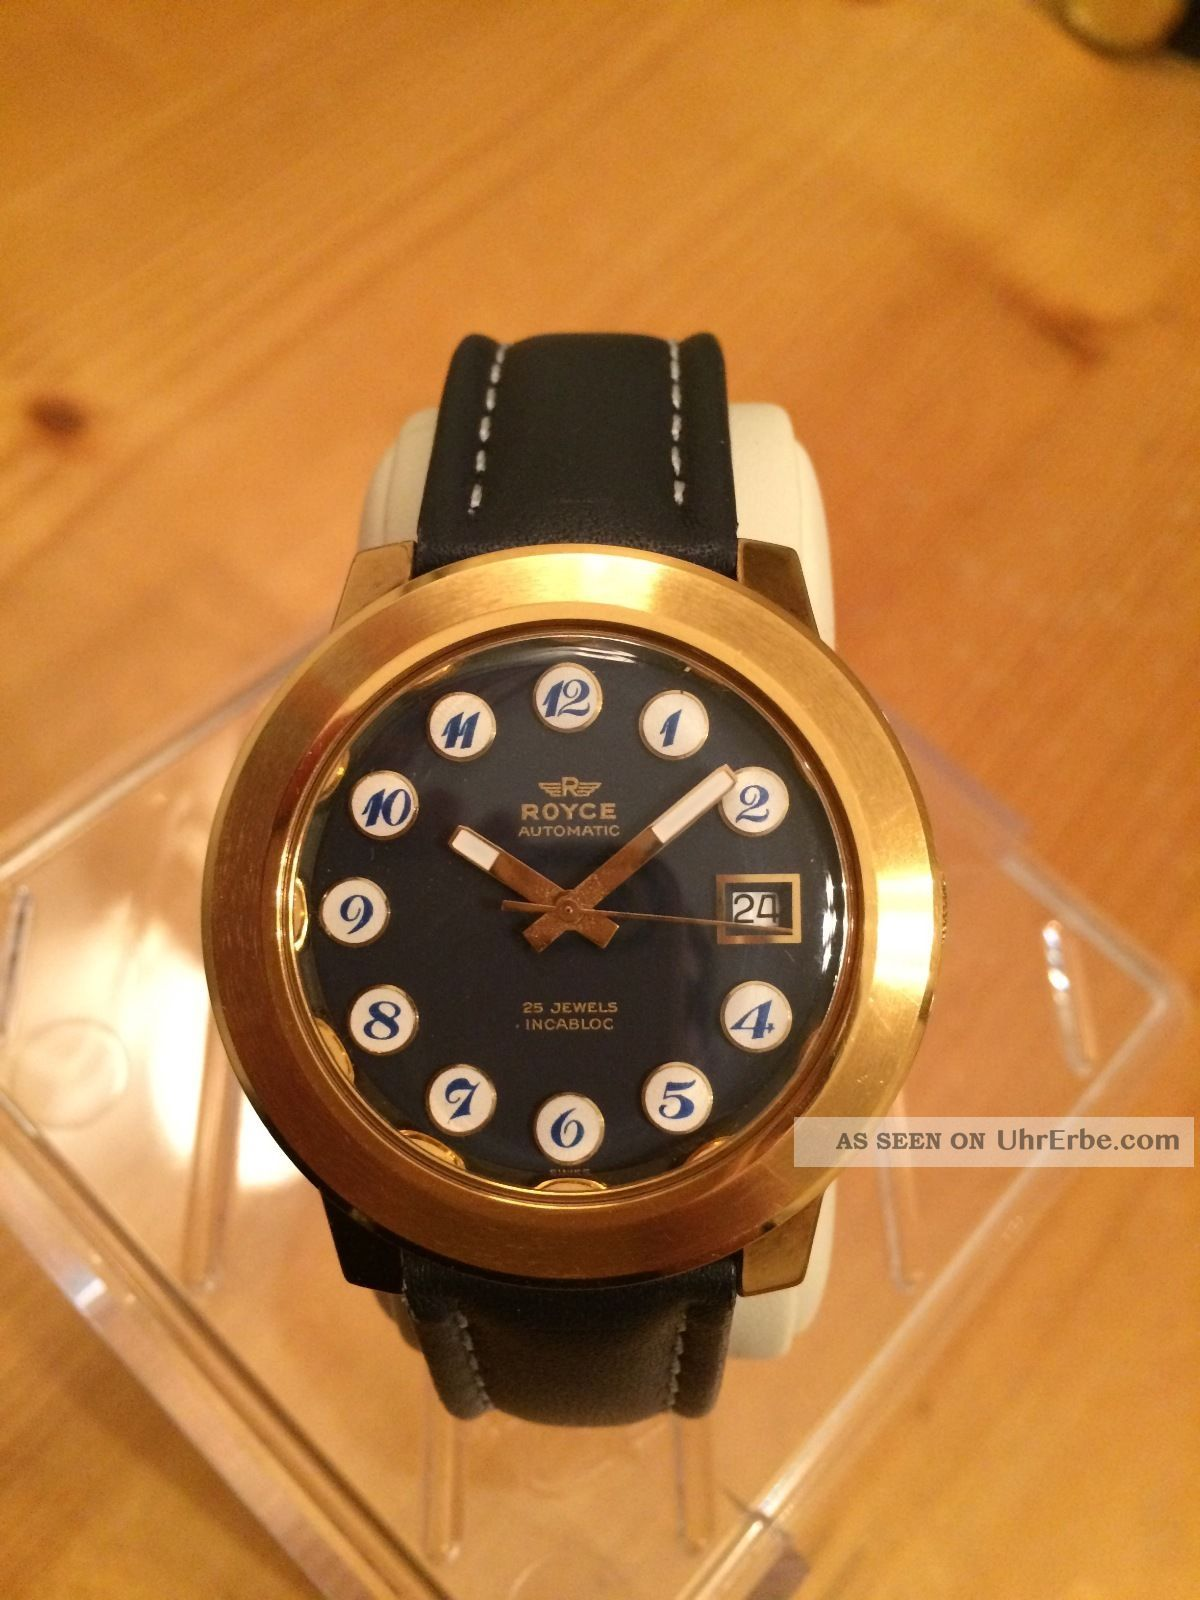 Tiefblaue Schönheit: Royce Automatik Im Bestzustand Armbanduhren Bild